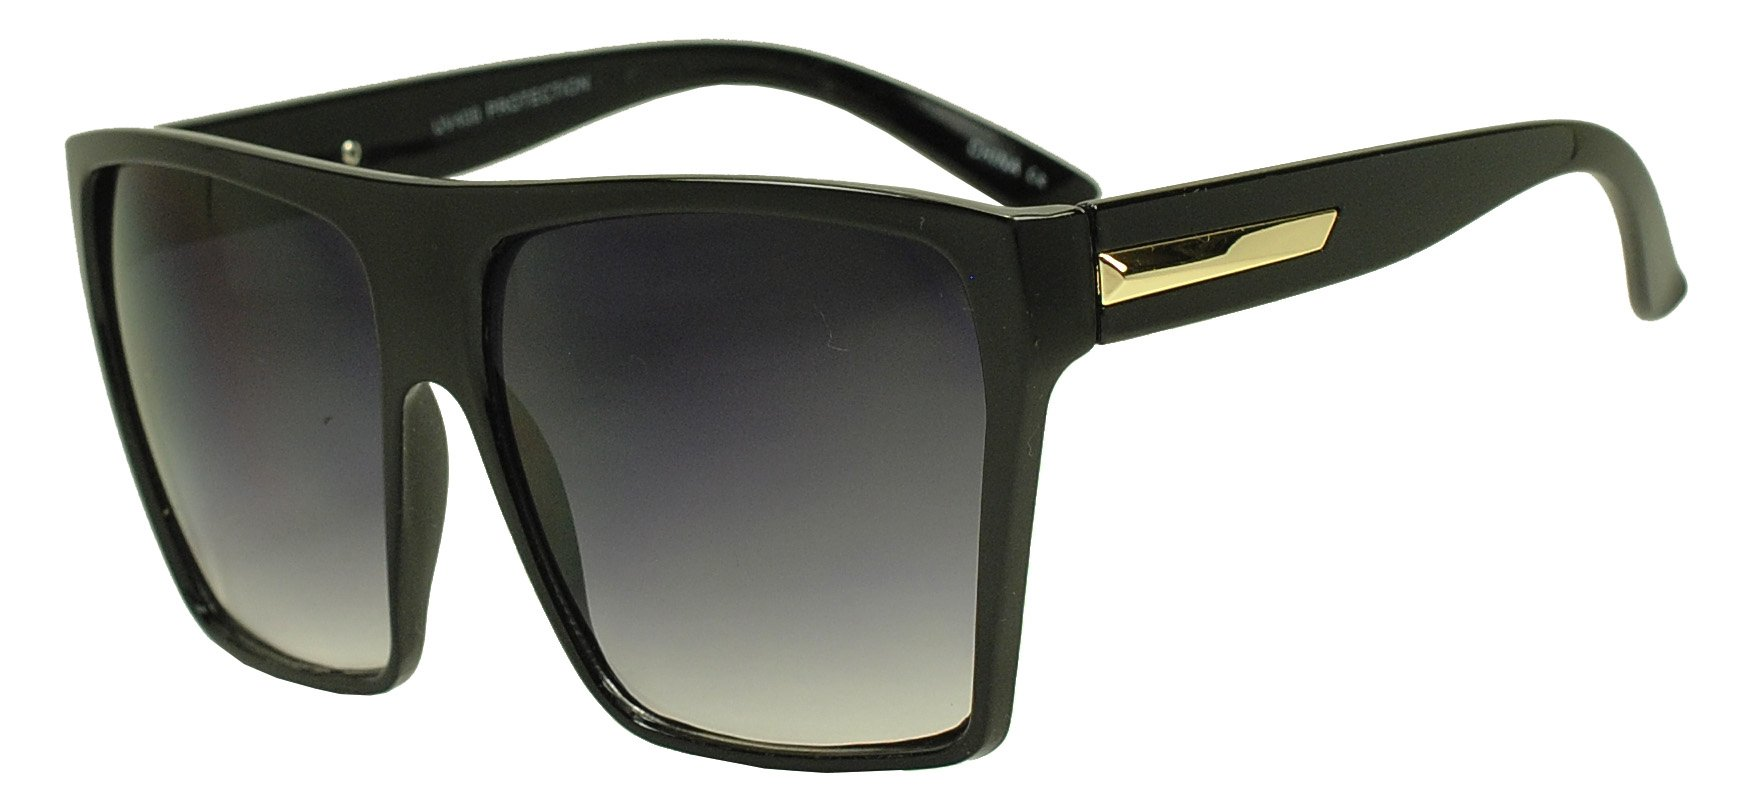 Sunglass Stop - Extra Large Square Retro Flat Top Oversized Aviator Sunglasses (Black | Gold , Black )